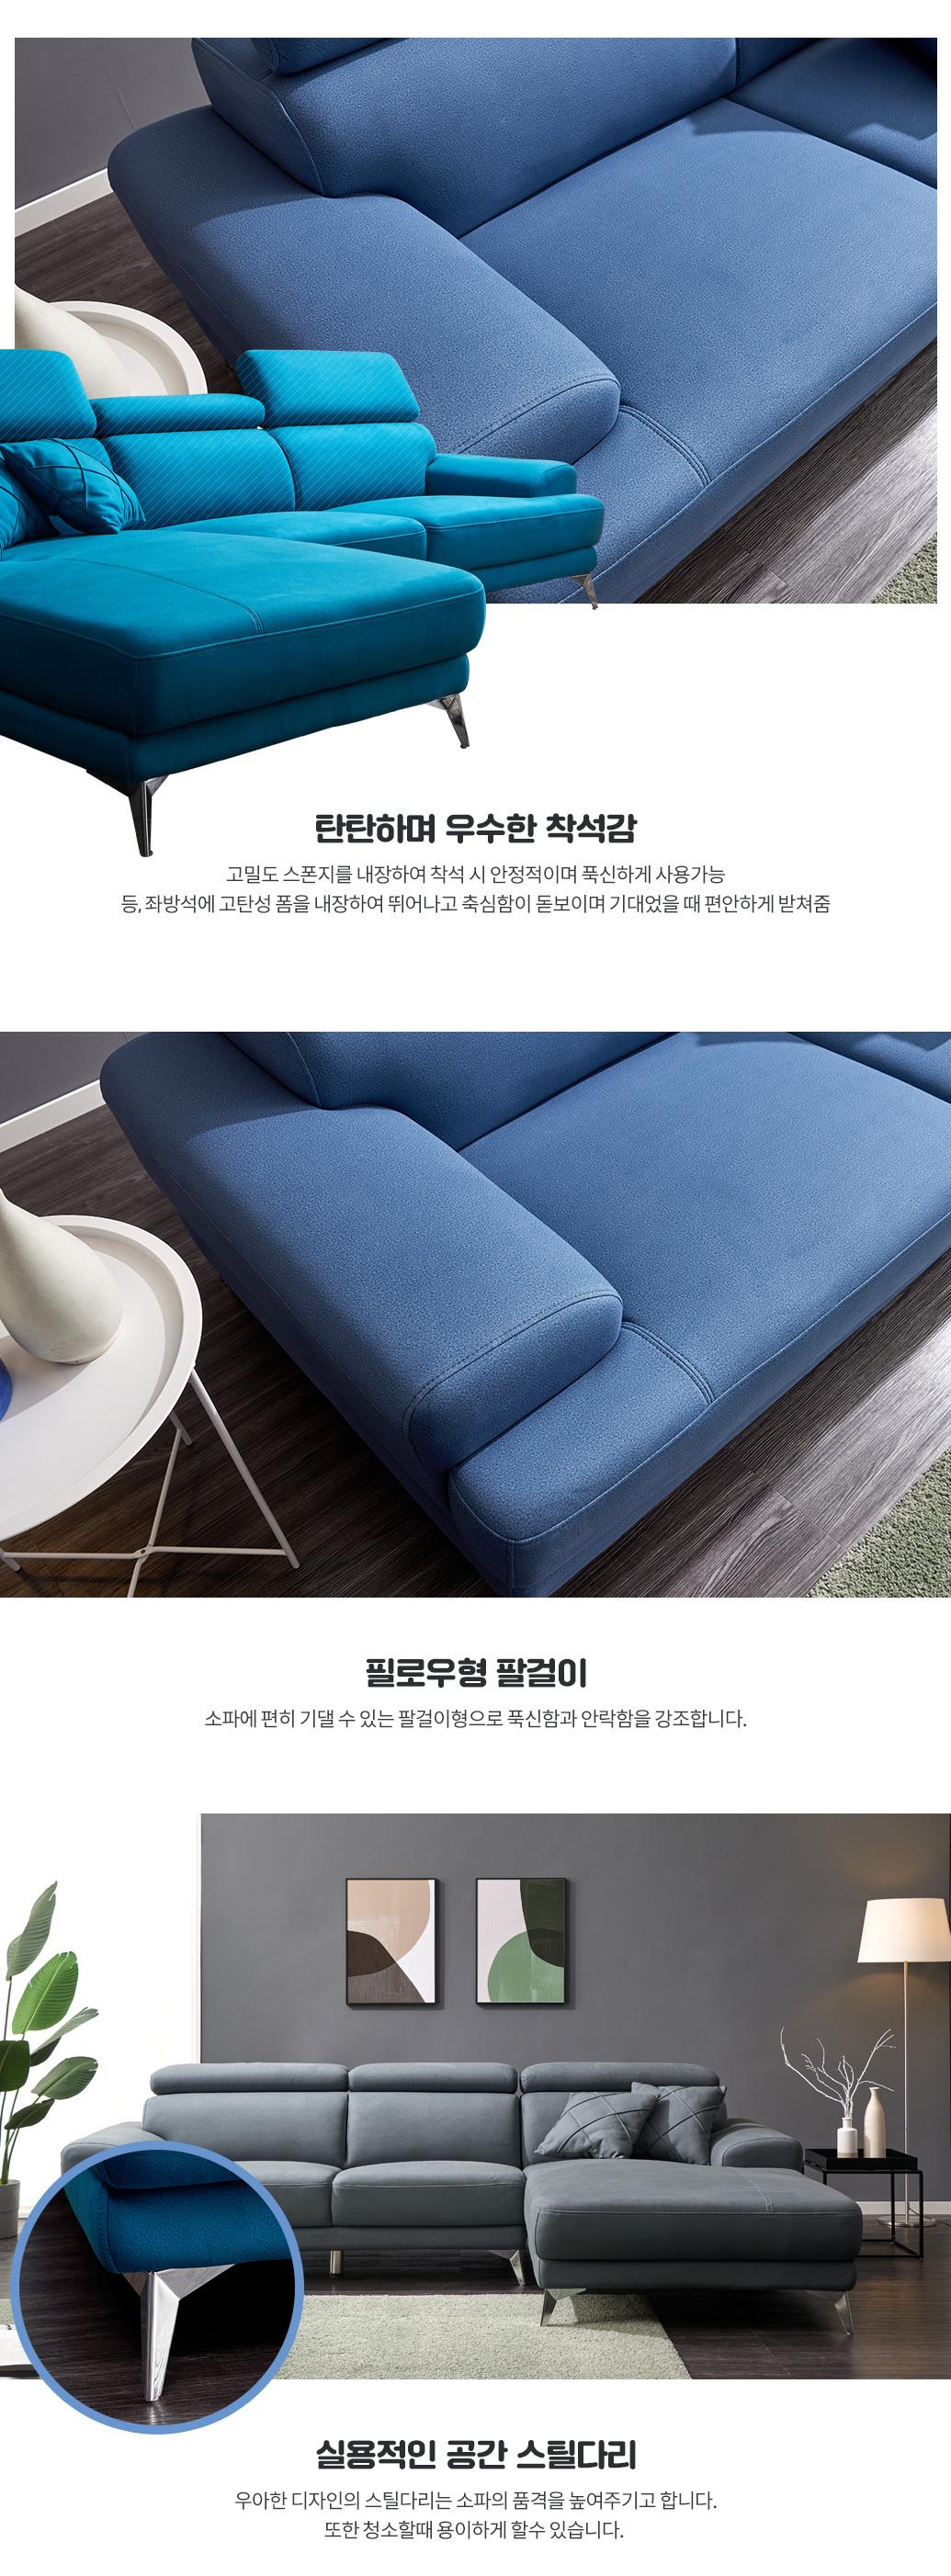 reve_couch_05.jpg